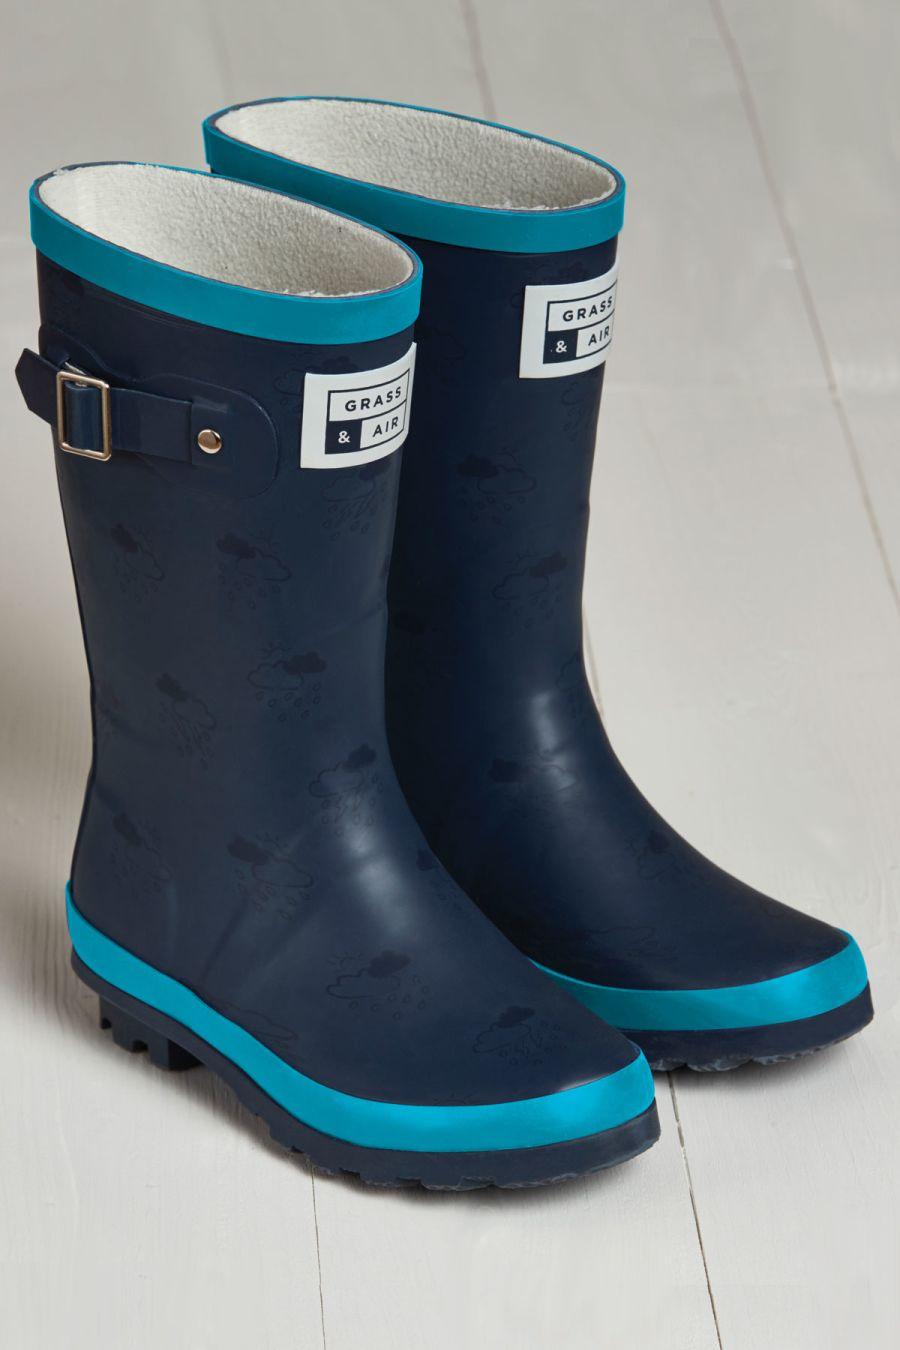 Navy/Turquoise Junior Wellies